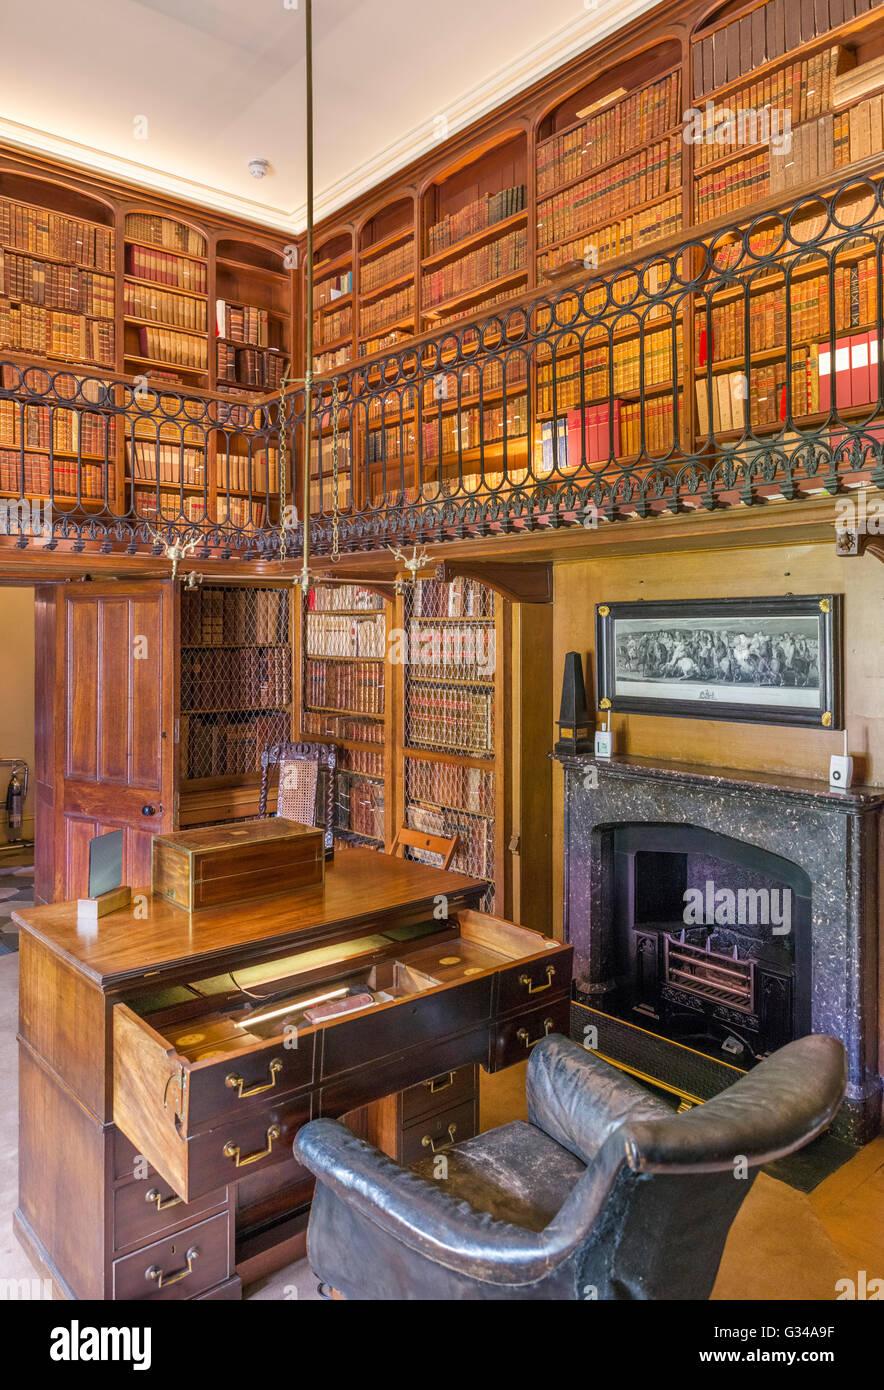 Sir Walter Scott's studiy in Abbotsford House, his former home, near Melrose, Scottish Borders, Scotland, UK - Stock Image